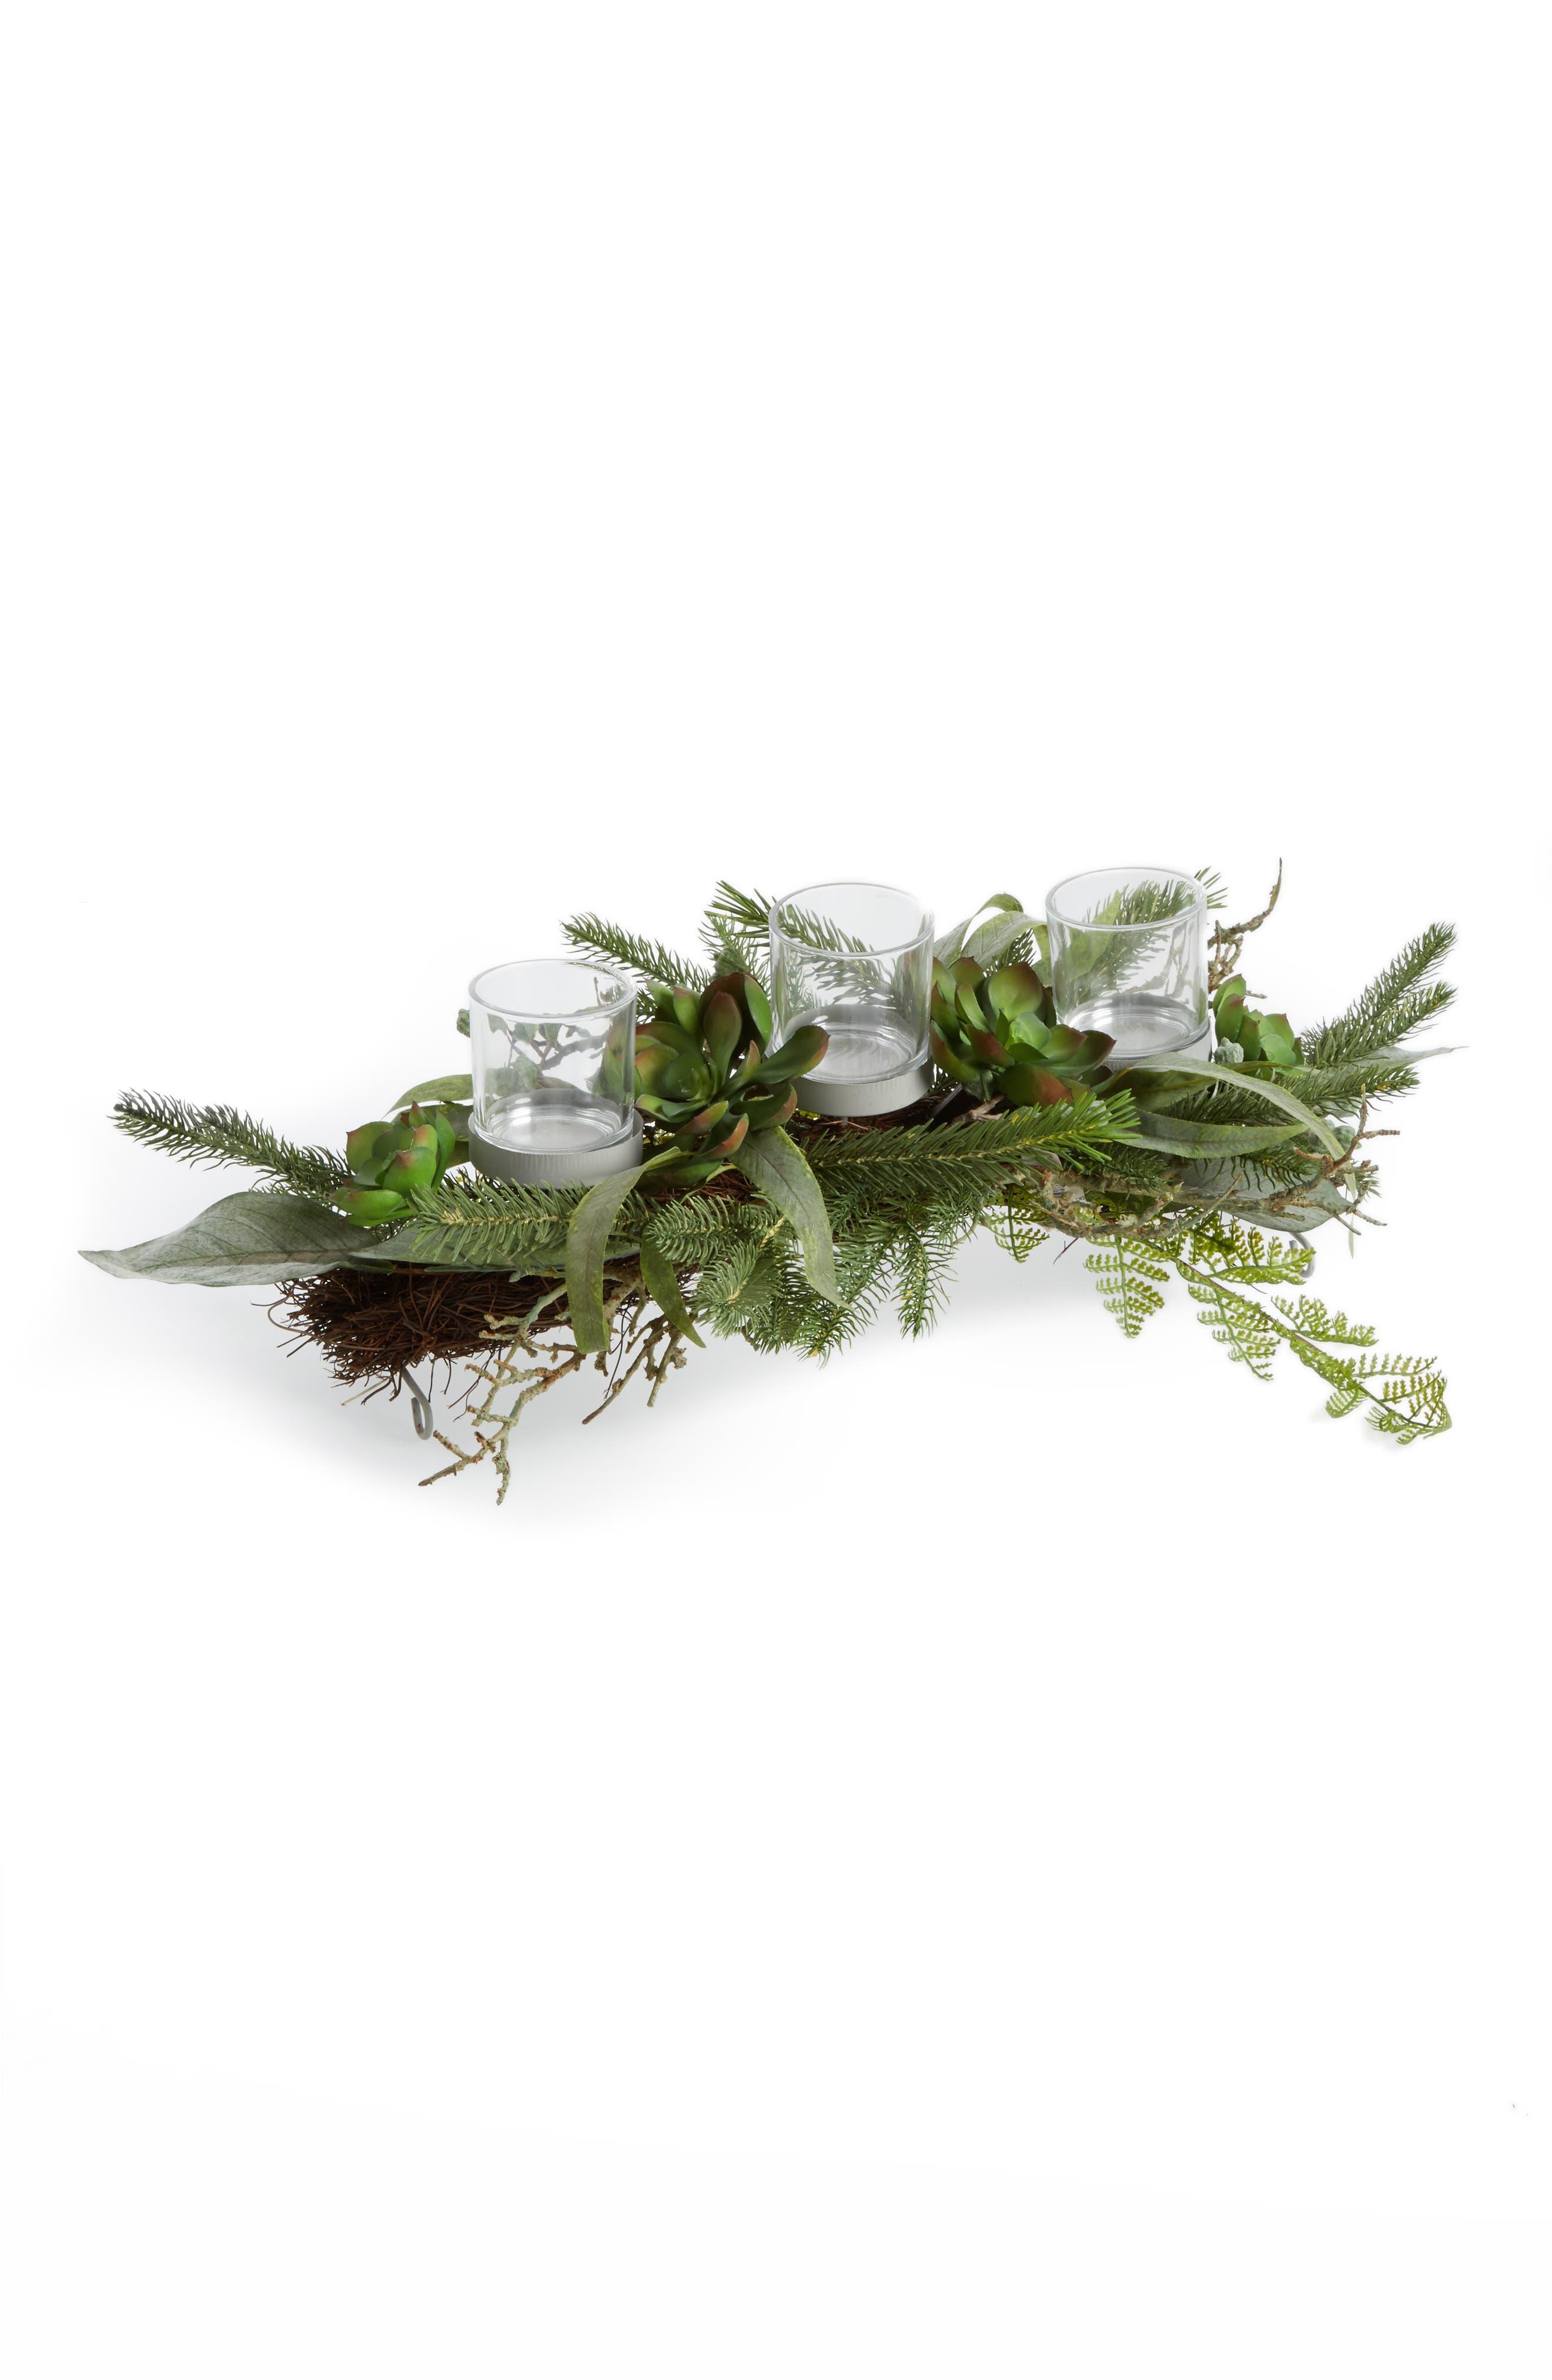 Alternate Image 1 Selected - ALLSTATE Succulent & Pine Votive Box